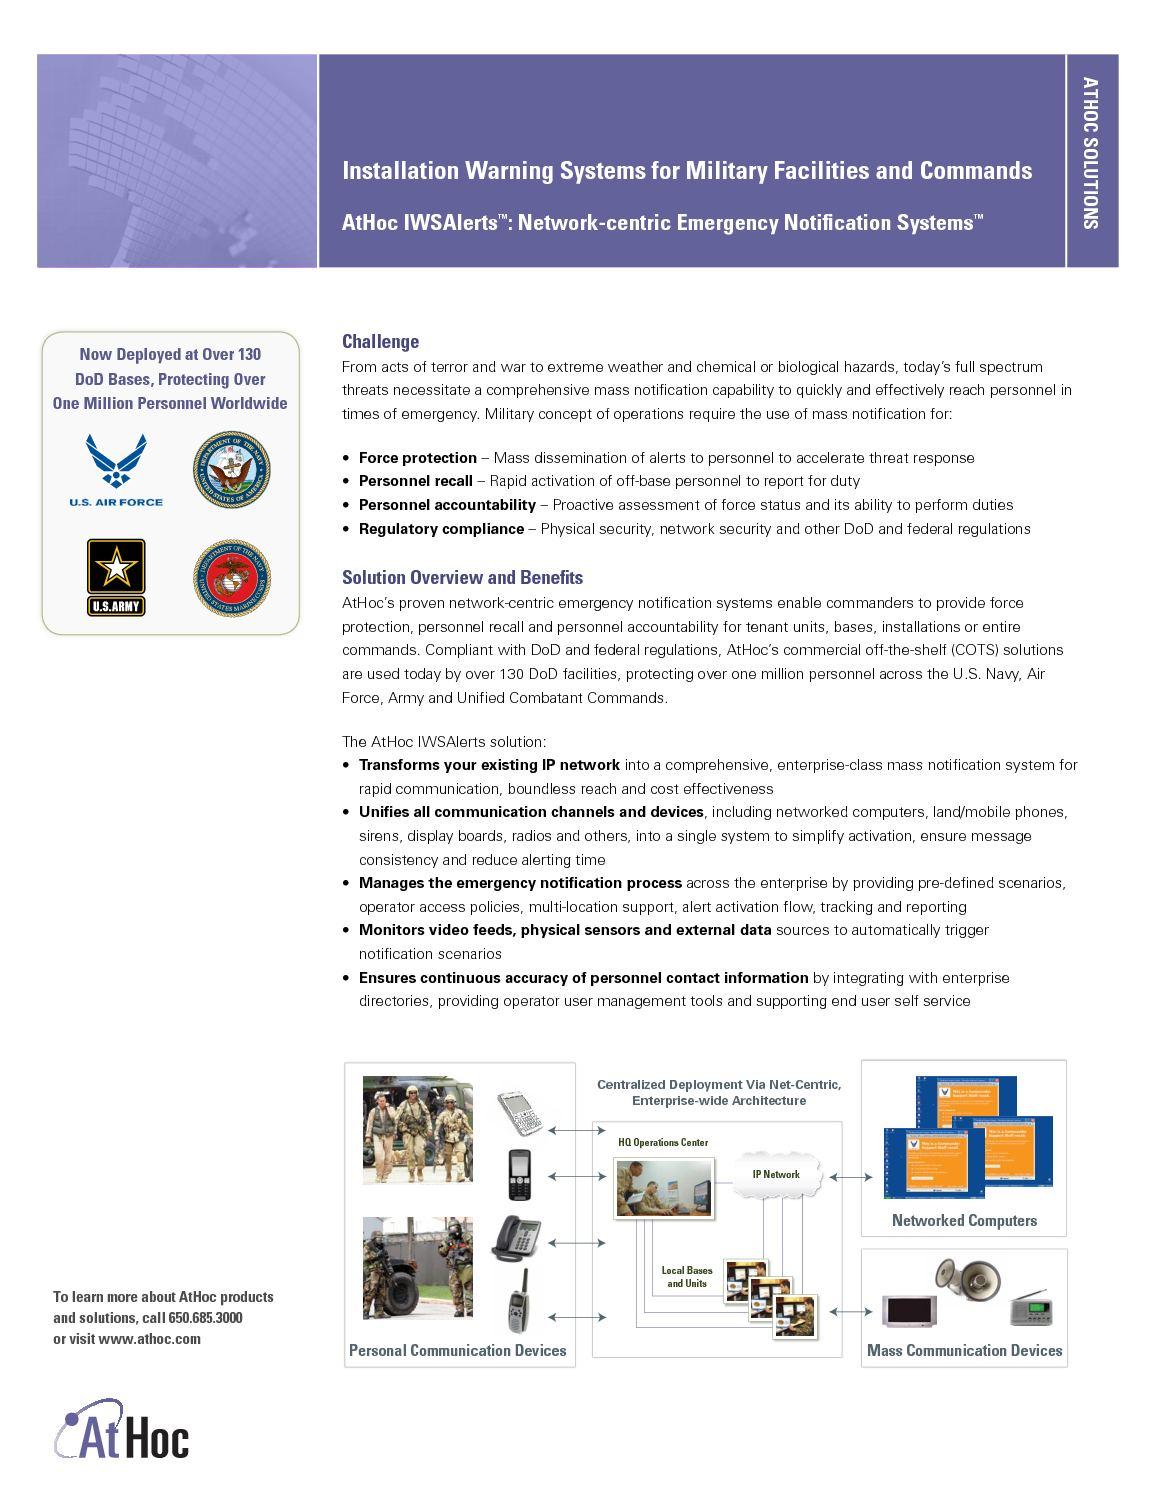 Calamo Department Of Defense Data Sheet From Athoc